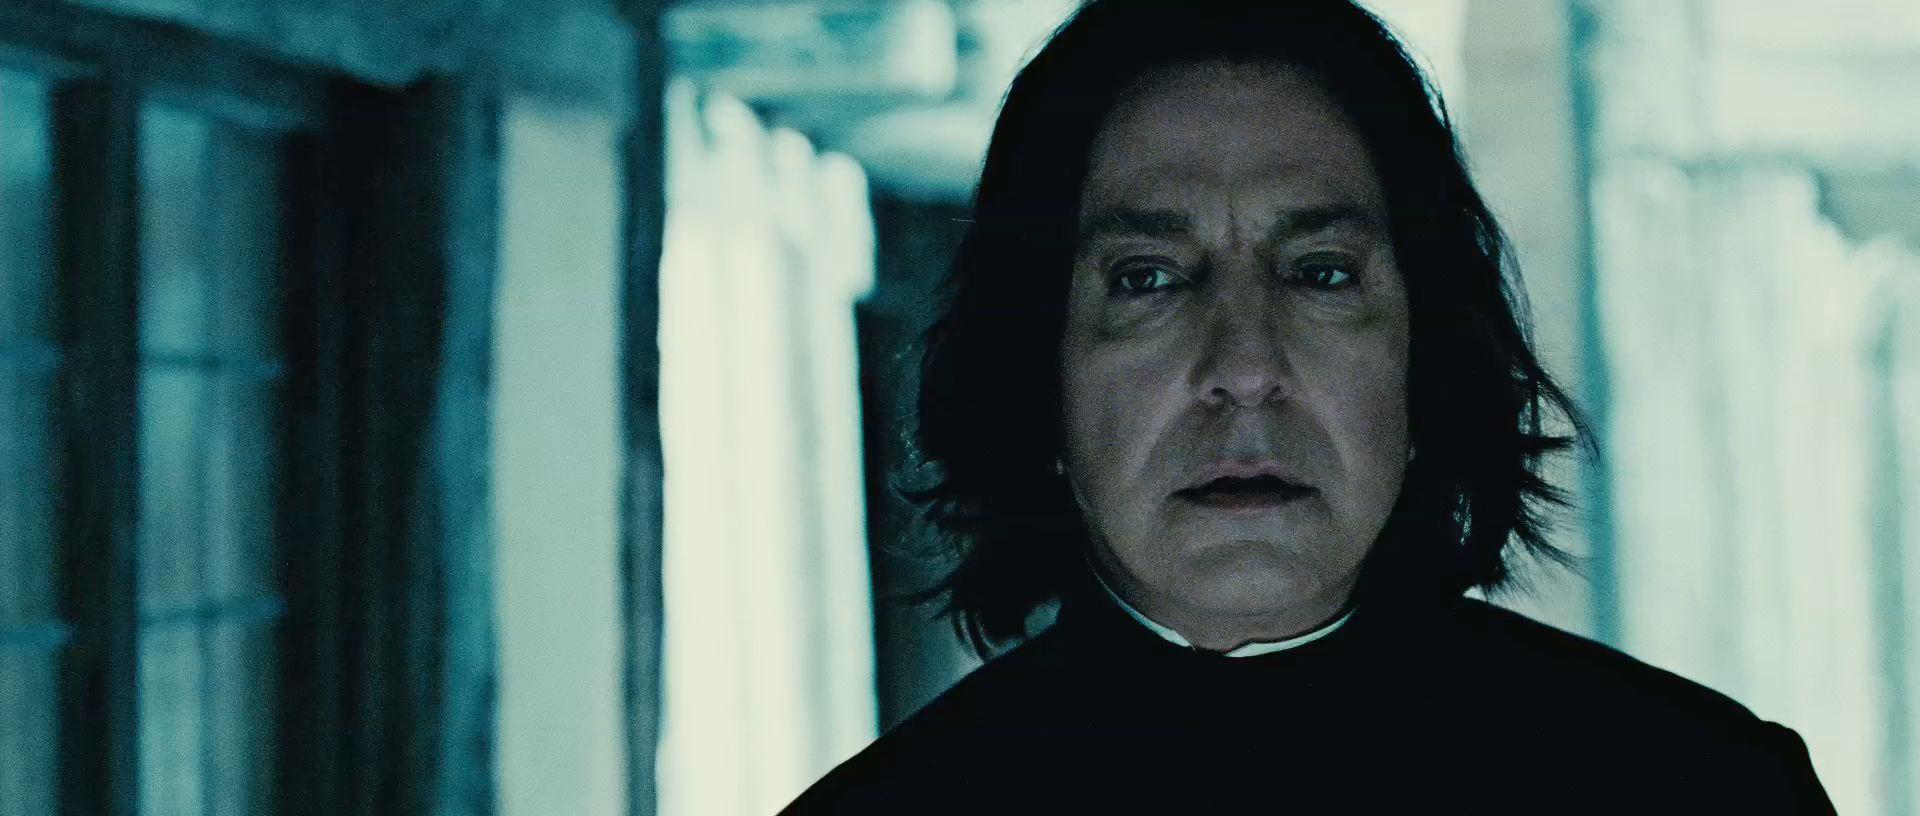 Harry Potter BlogHogwarts HP7 2 Trailer 31